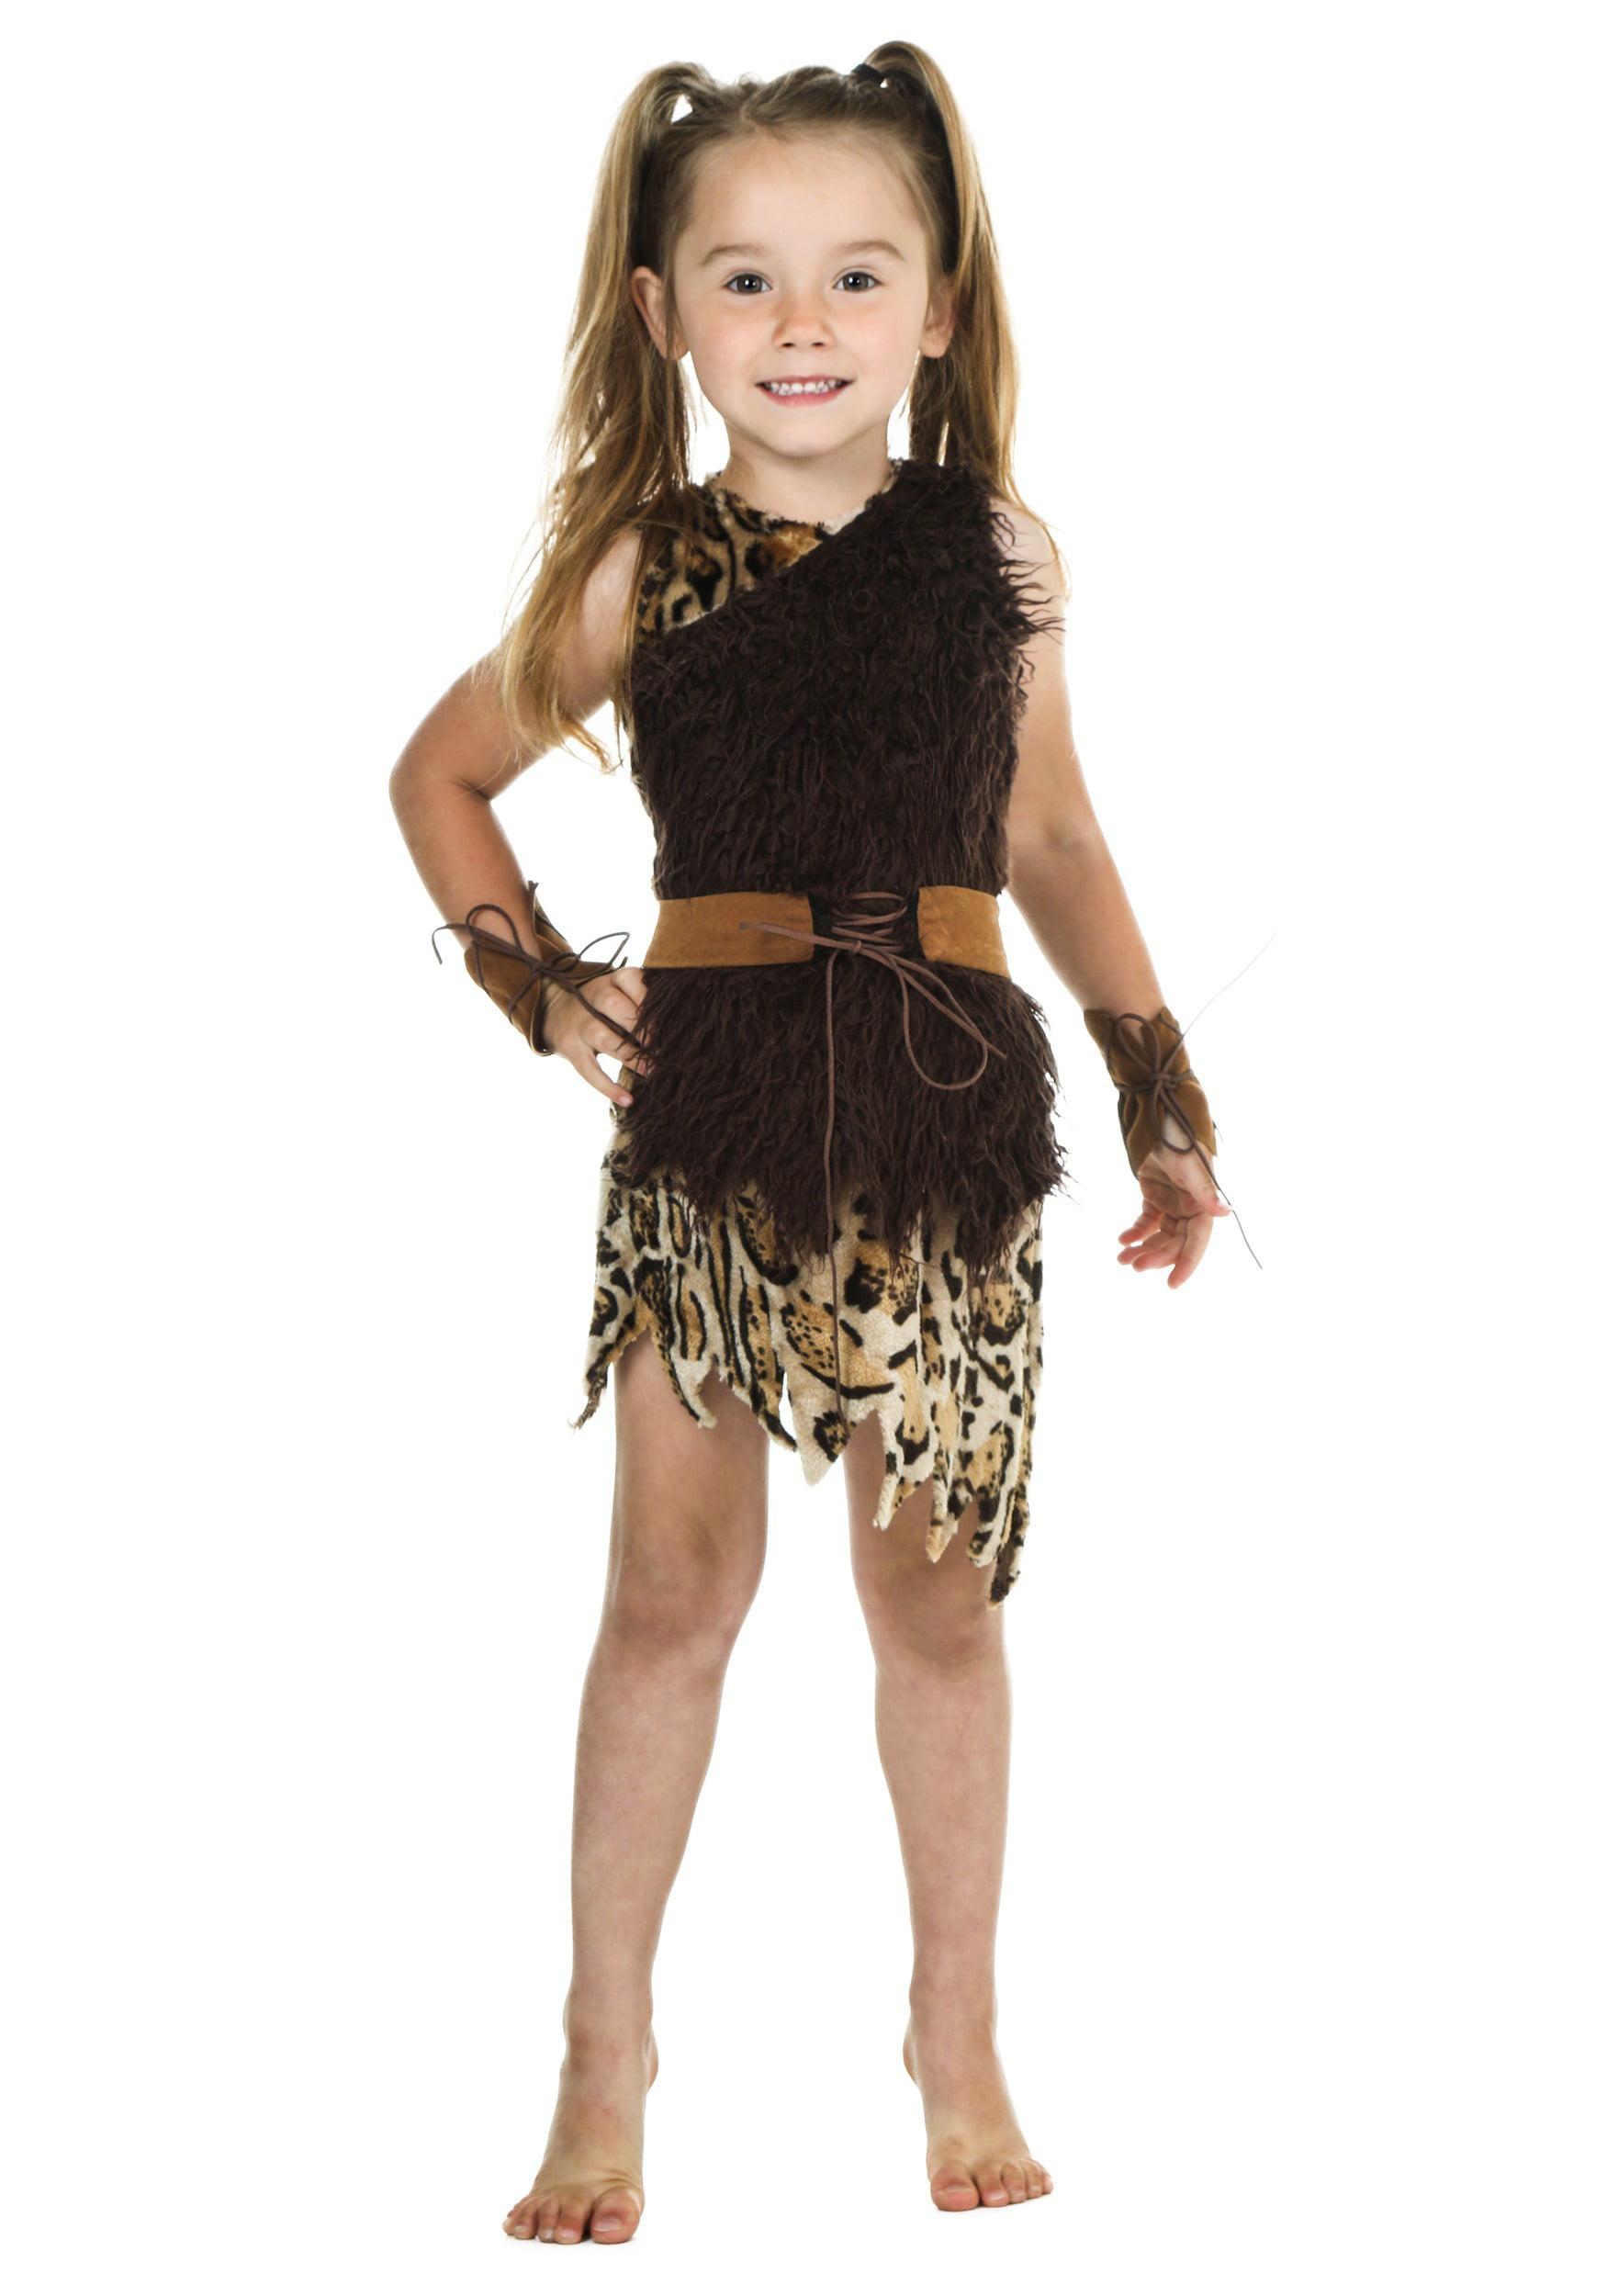 sc 1 st  Walmart & Toddler Cavegirl Costume - Walmart.com